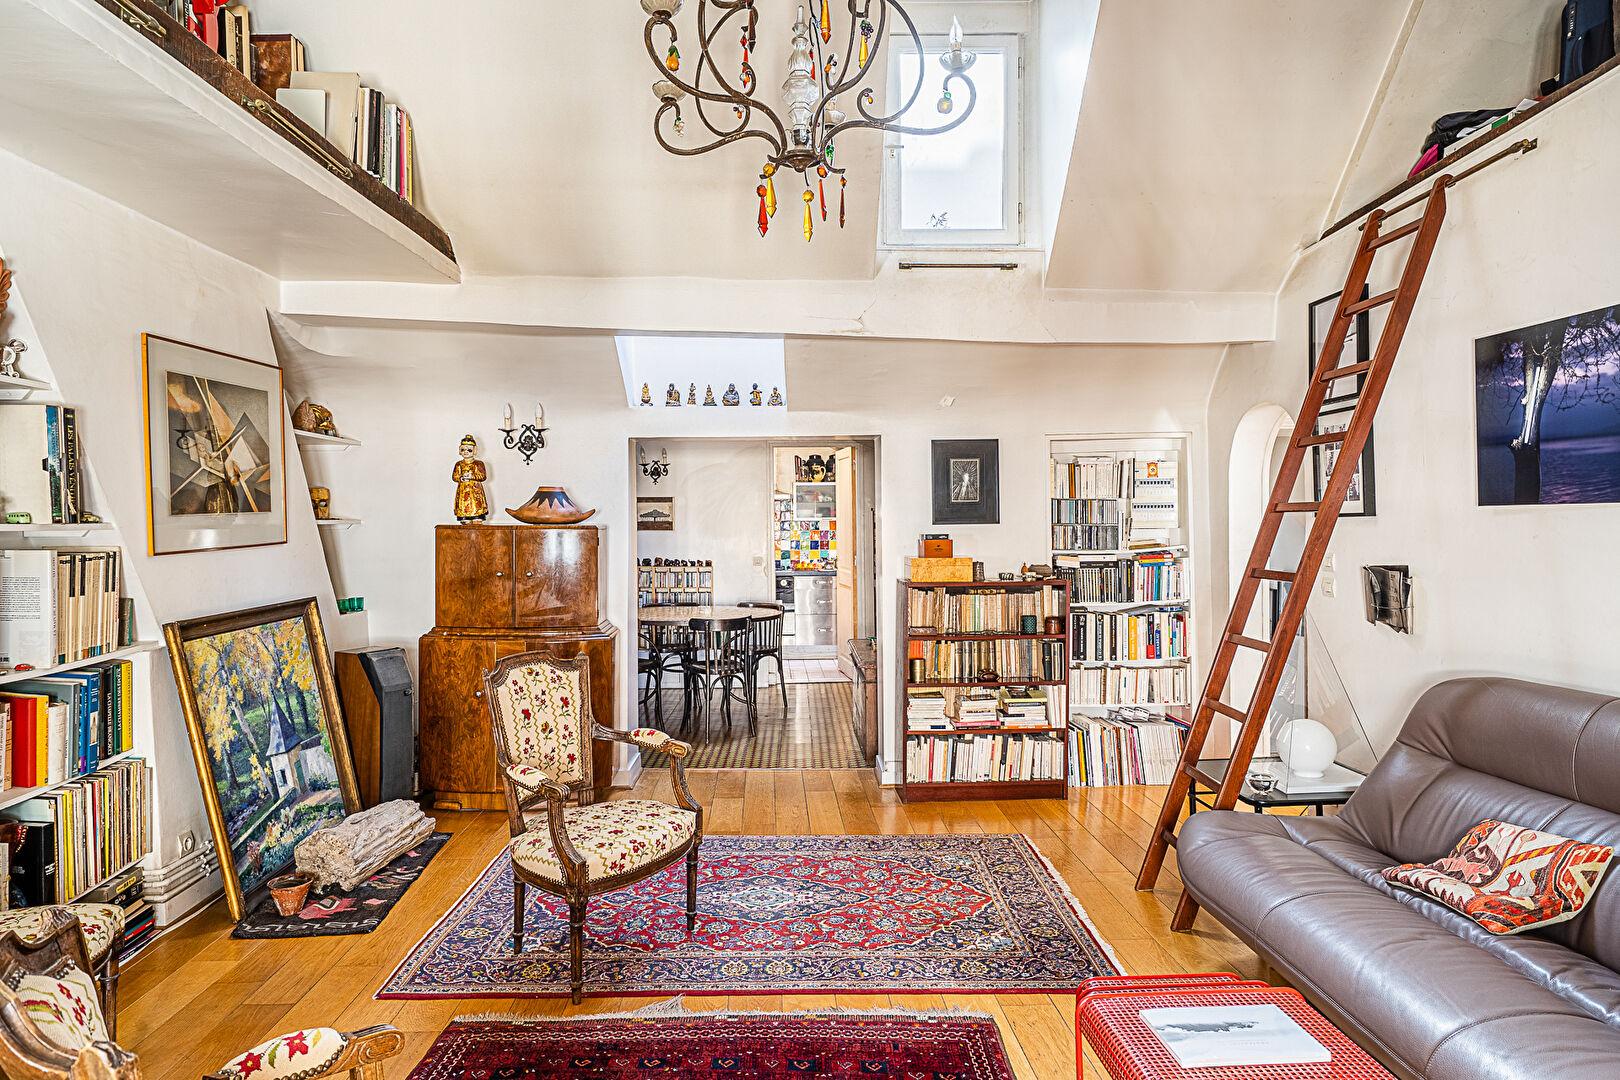 APARTMENT FOR SALE PARIS 75007 RUE DE VERNEUIL CARRE DES ANTIQUAIRES 4th and 5th and last floor - 2